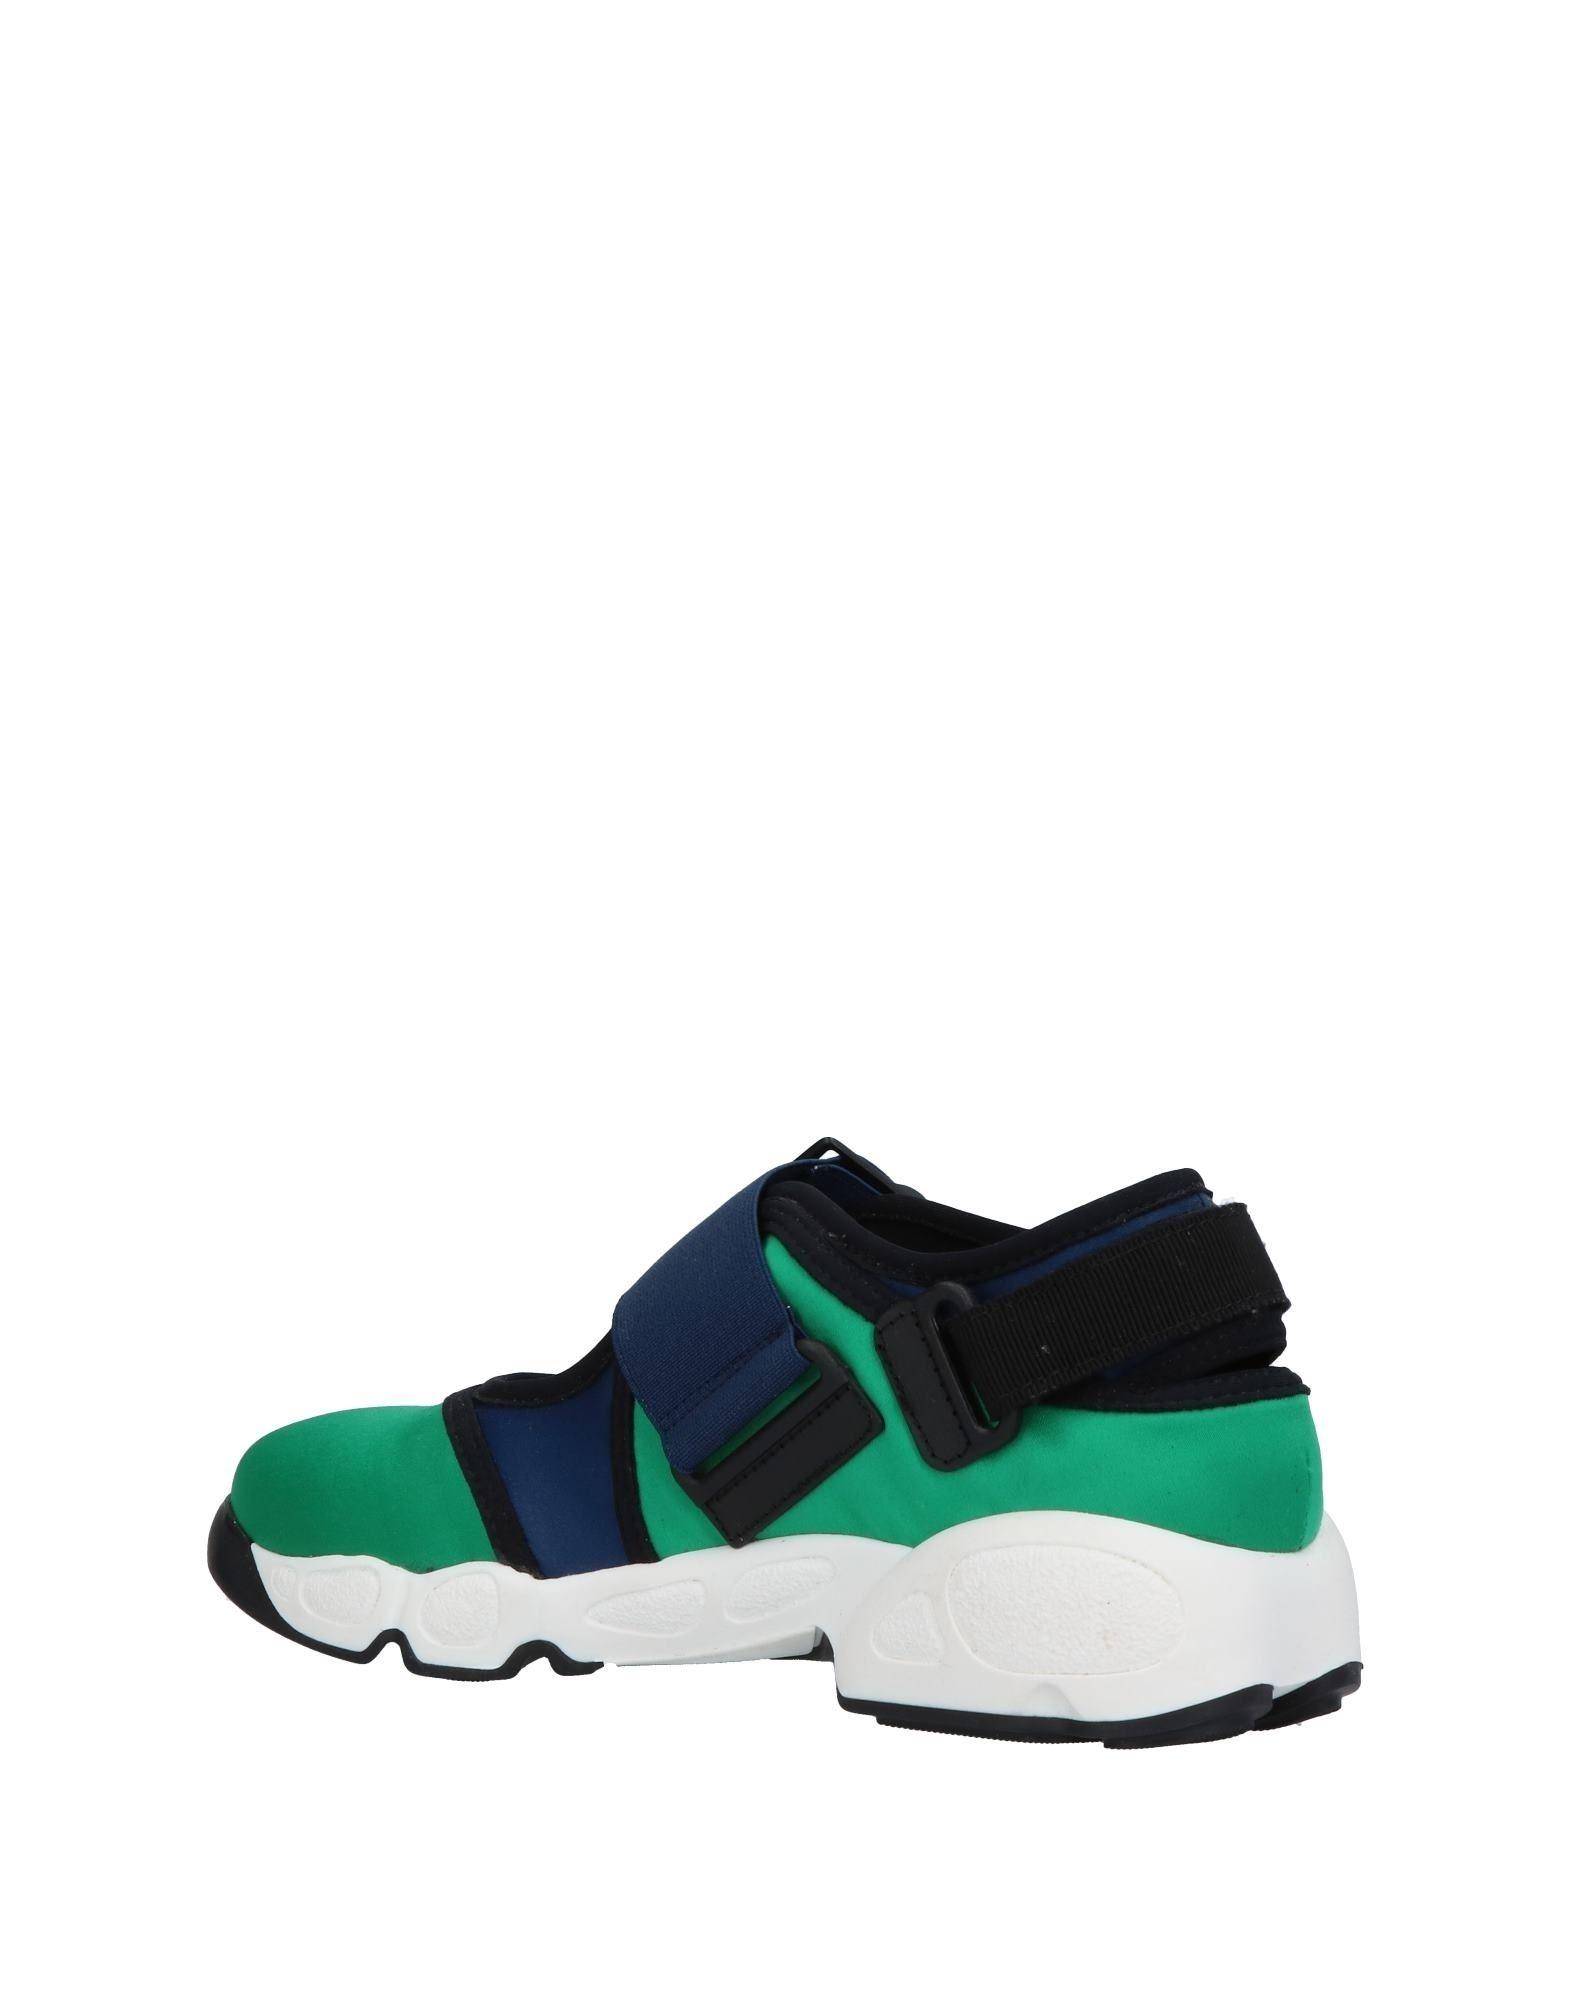 Erika Cavallini Schuhe Sneakers Damen  11388009LA Gute Qualität beliebte Schuhe Cavallini 98d9ea